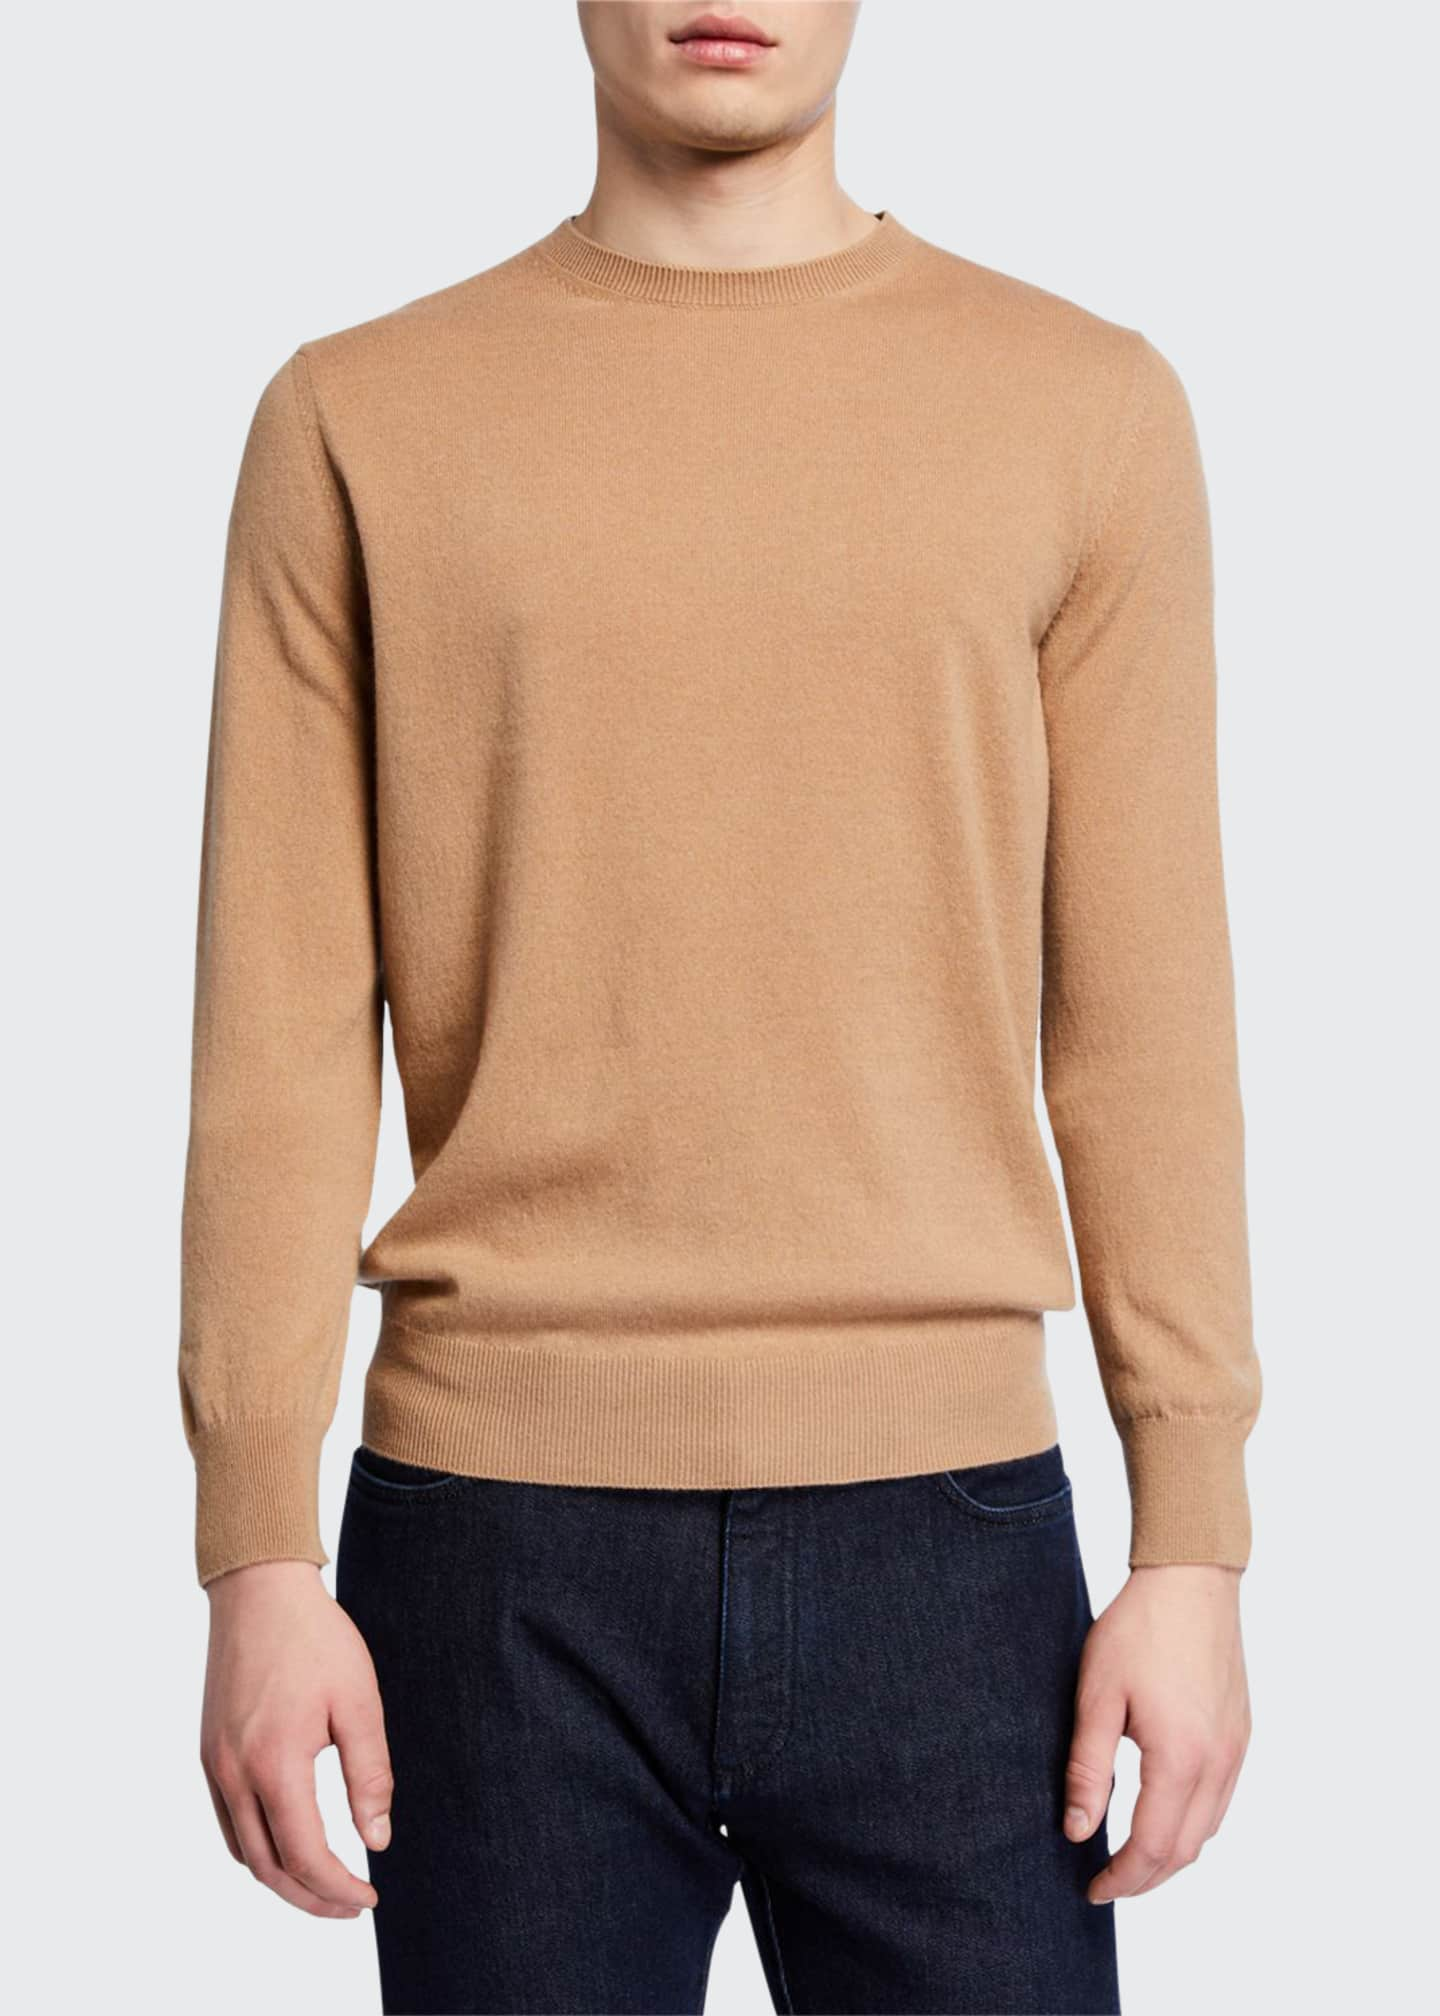 Ermenegildo Zegna Men's Premium Cashmere Crewneck Sweater